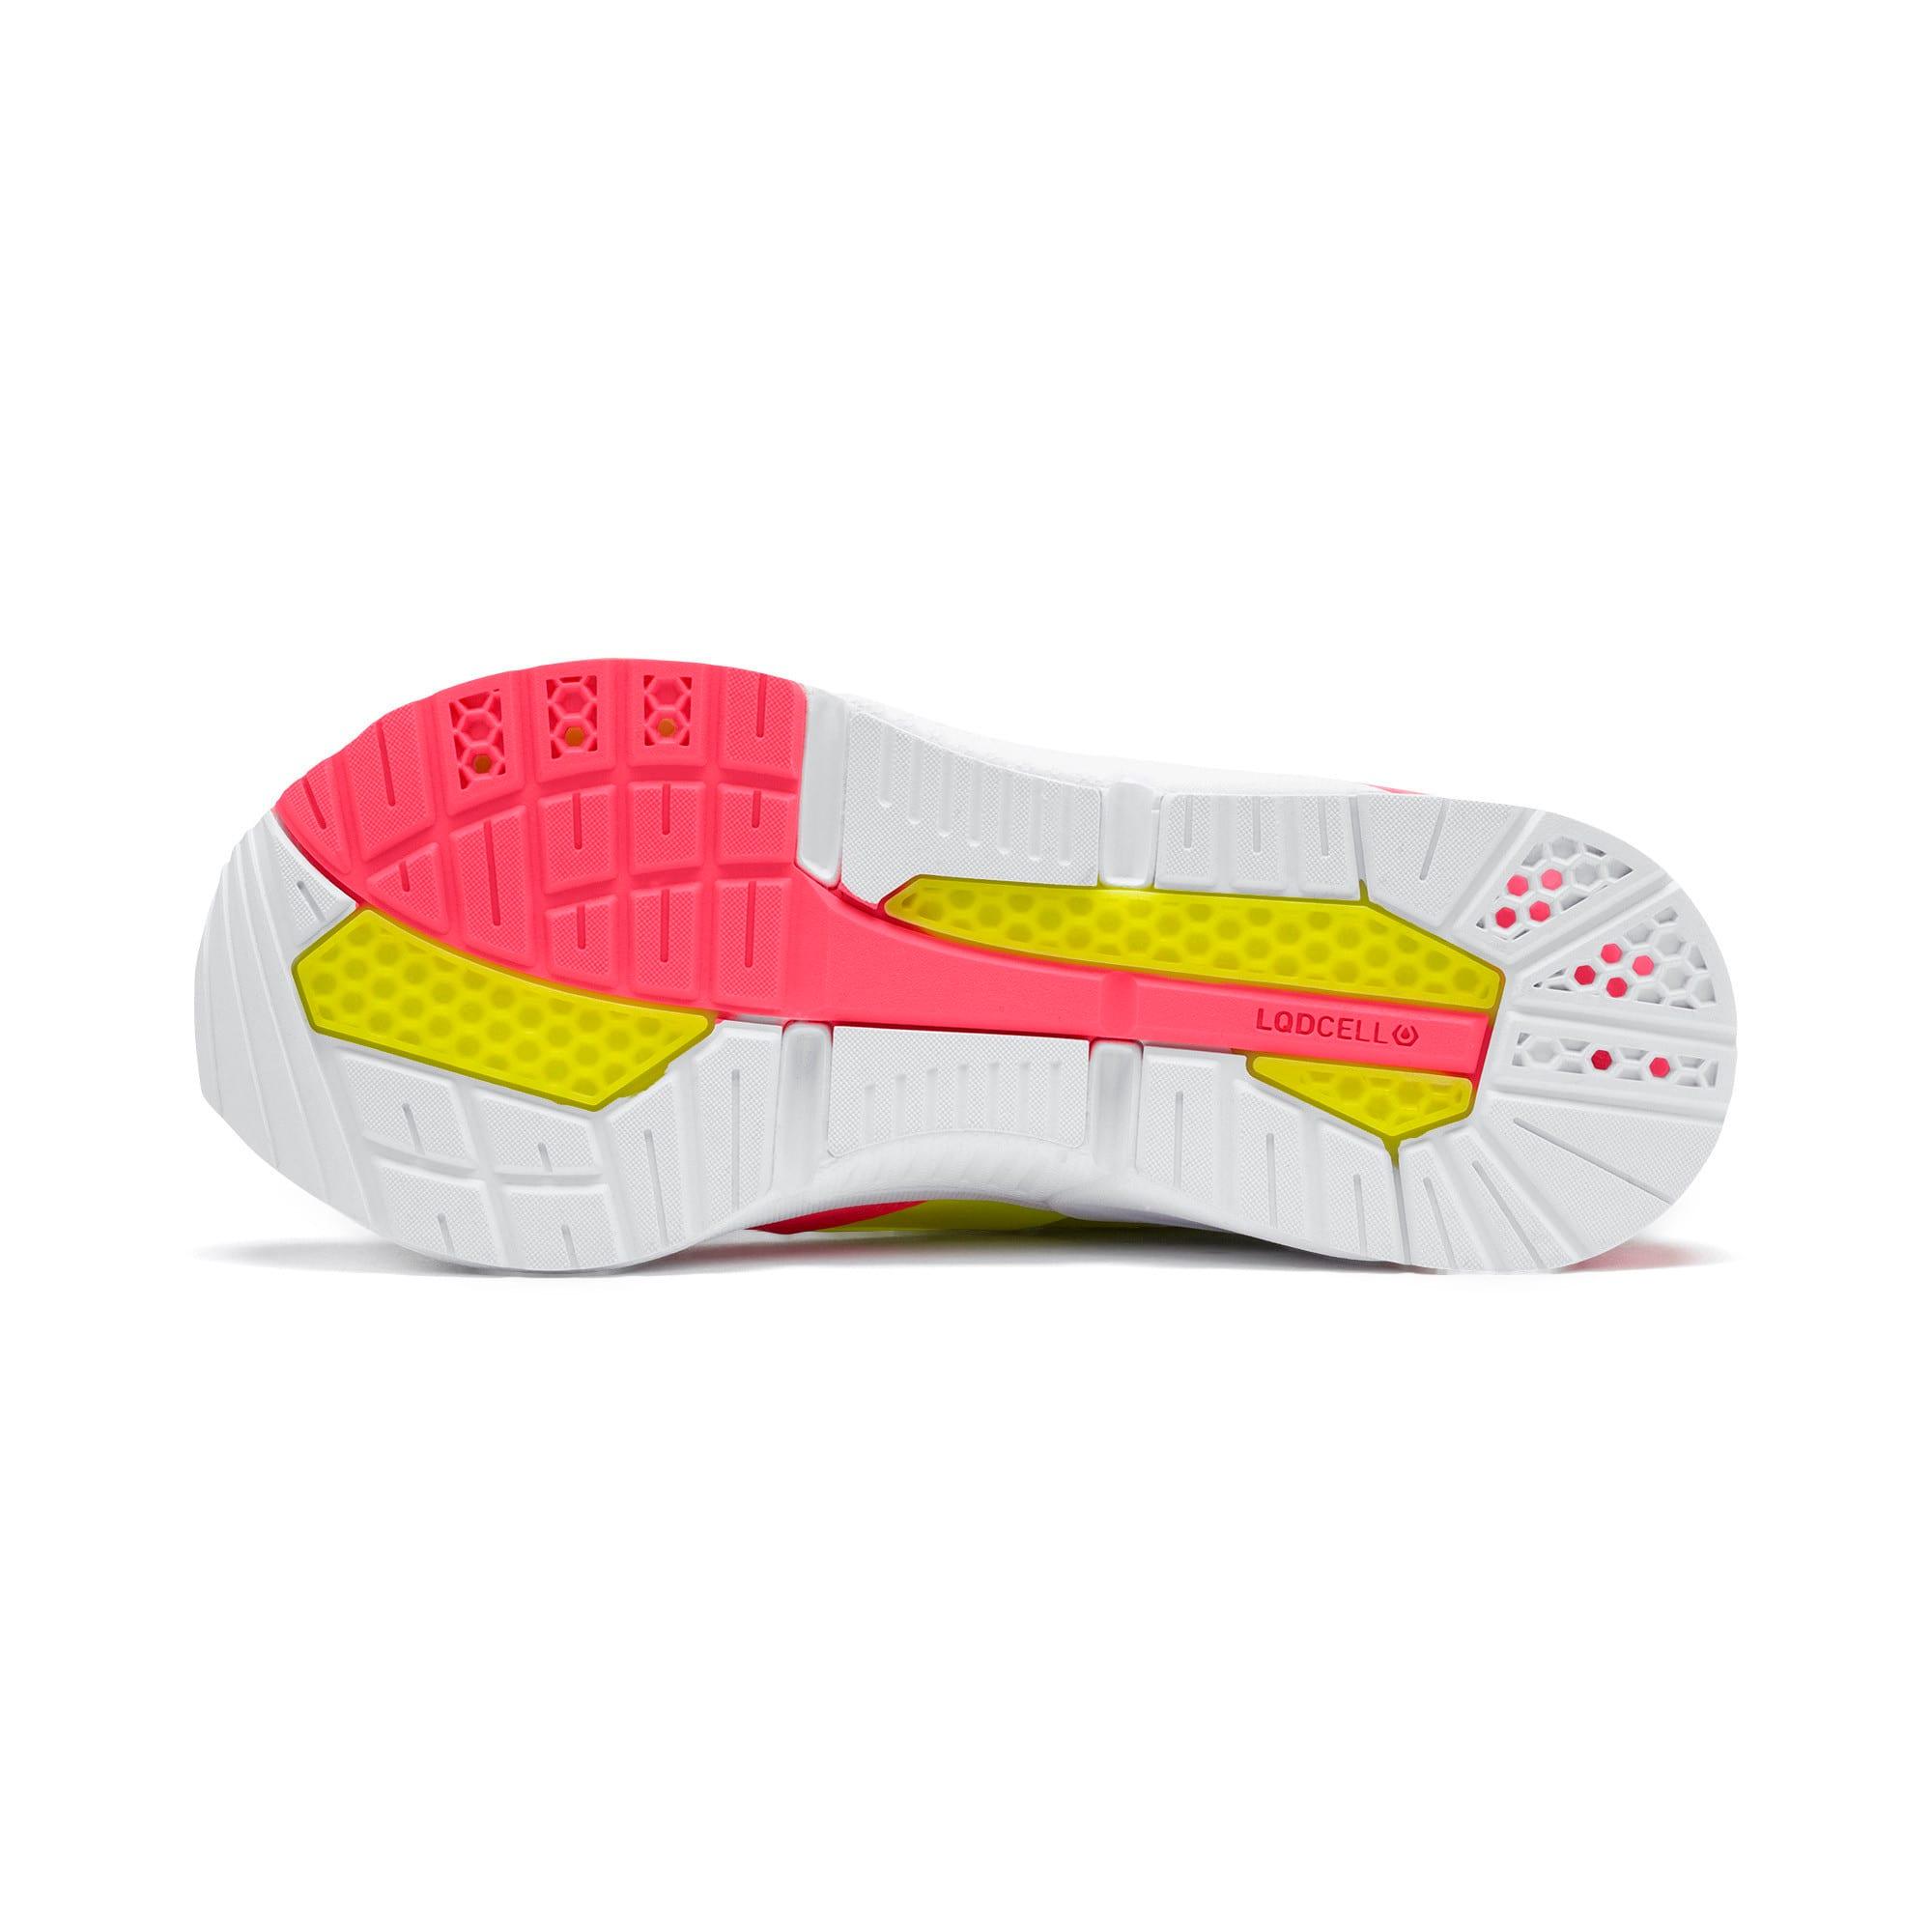 Thumbnail 5 of LQDCELL Optic Training Shoes, Puma White-Y Alert-Pin Alert, medium